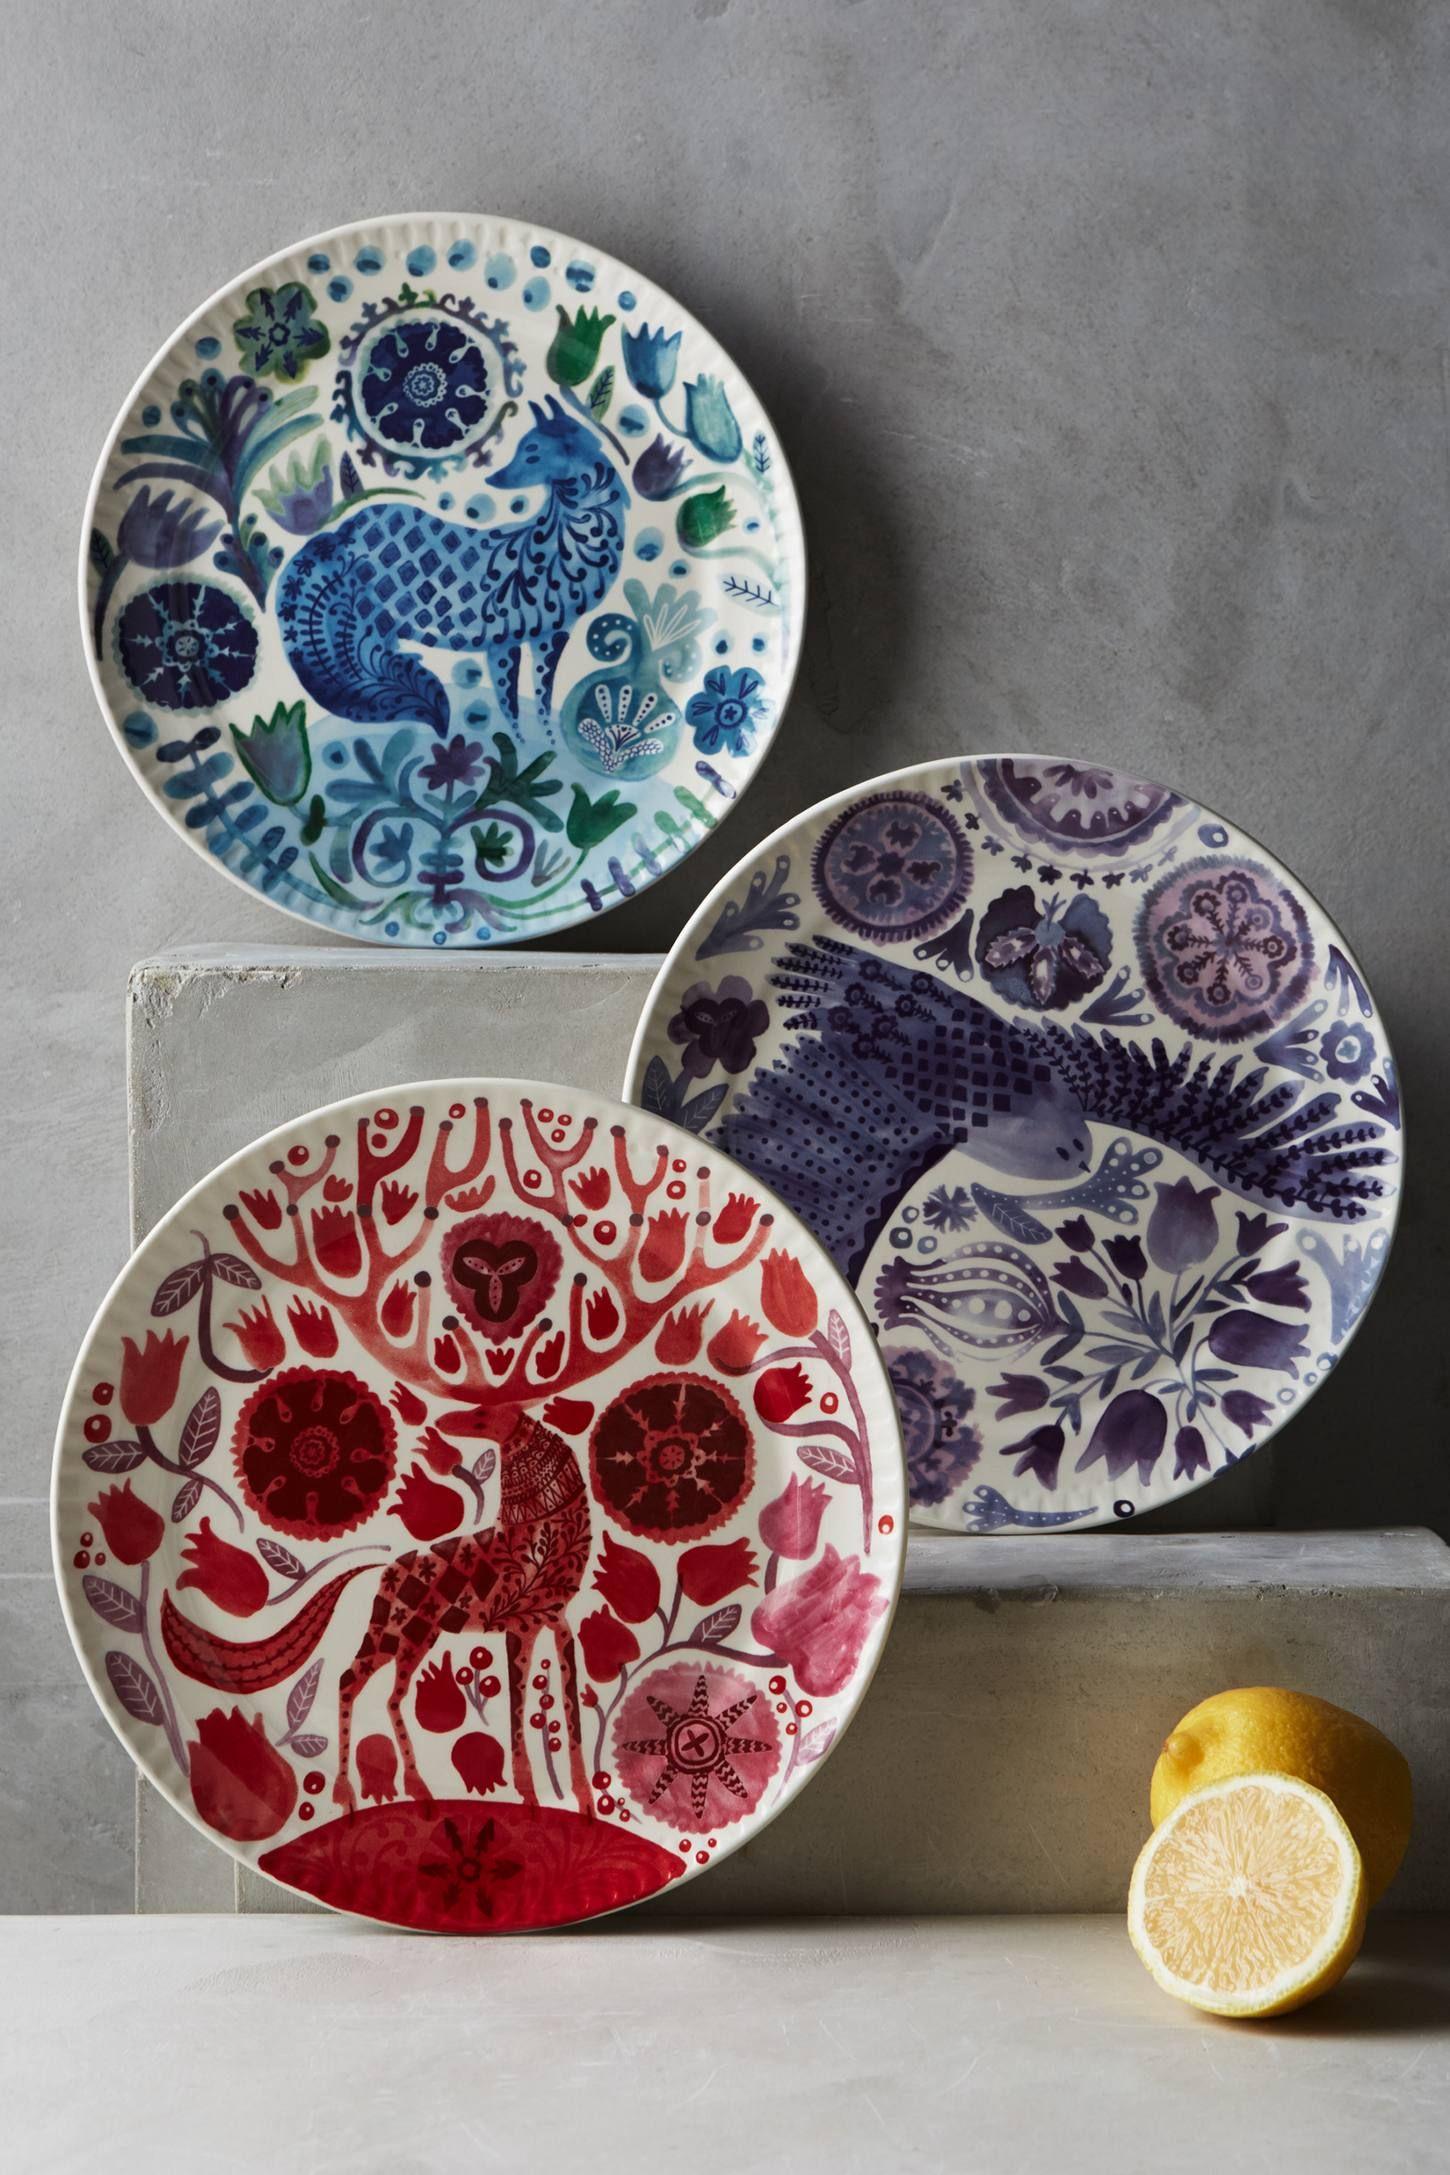 Nordic Sunrise Dessert Plate - anthropologie.com | Plate Me Up ...